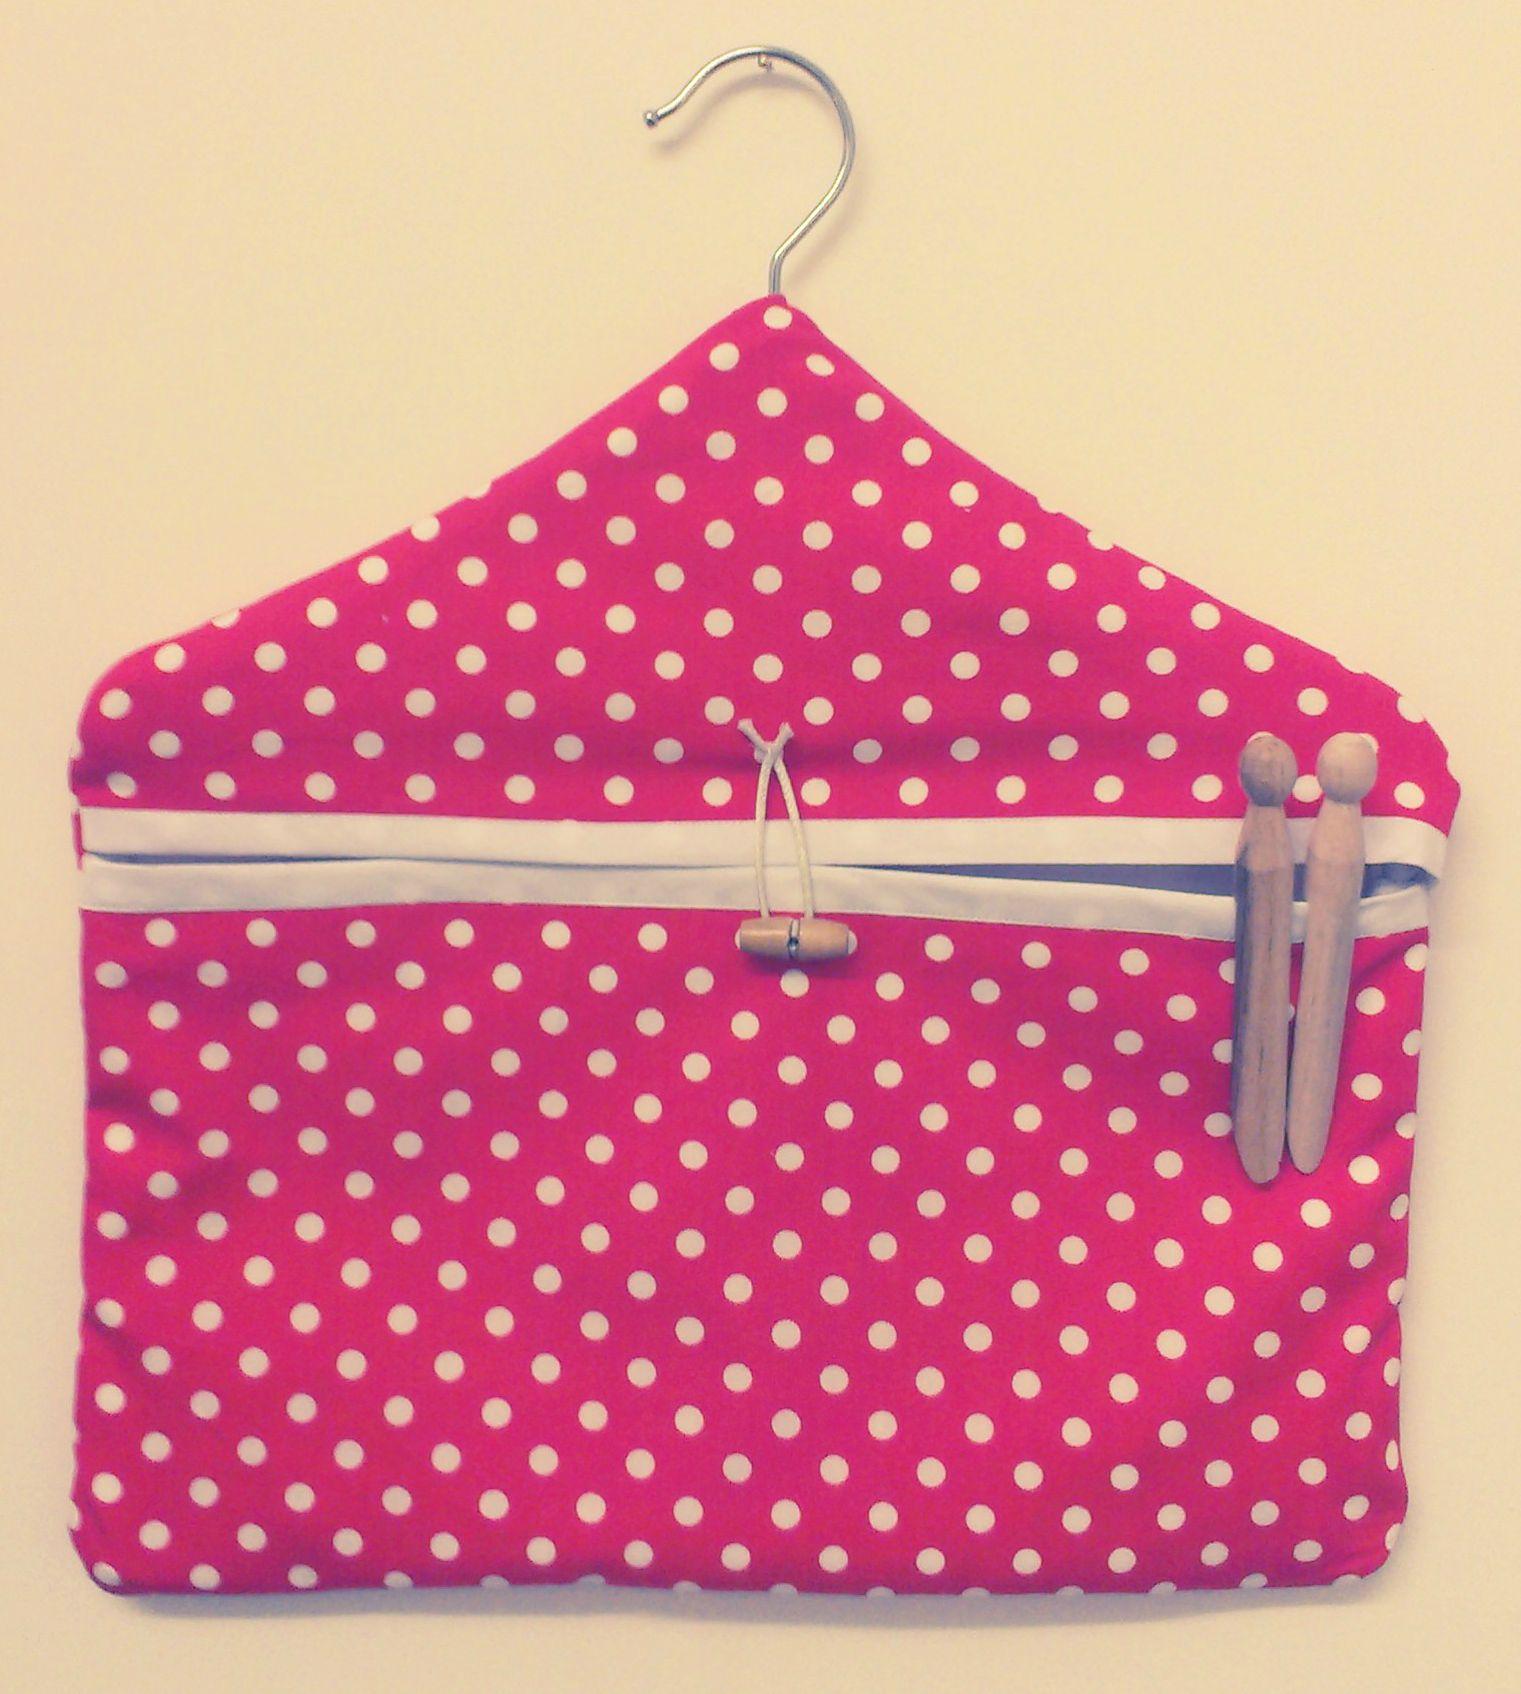 HANDMADE CLOTHES PIN BAG